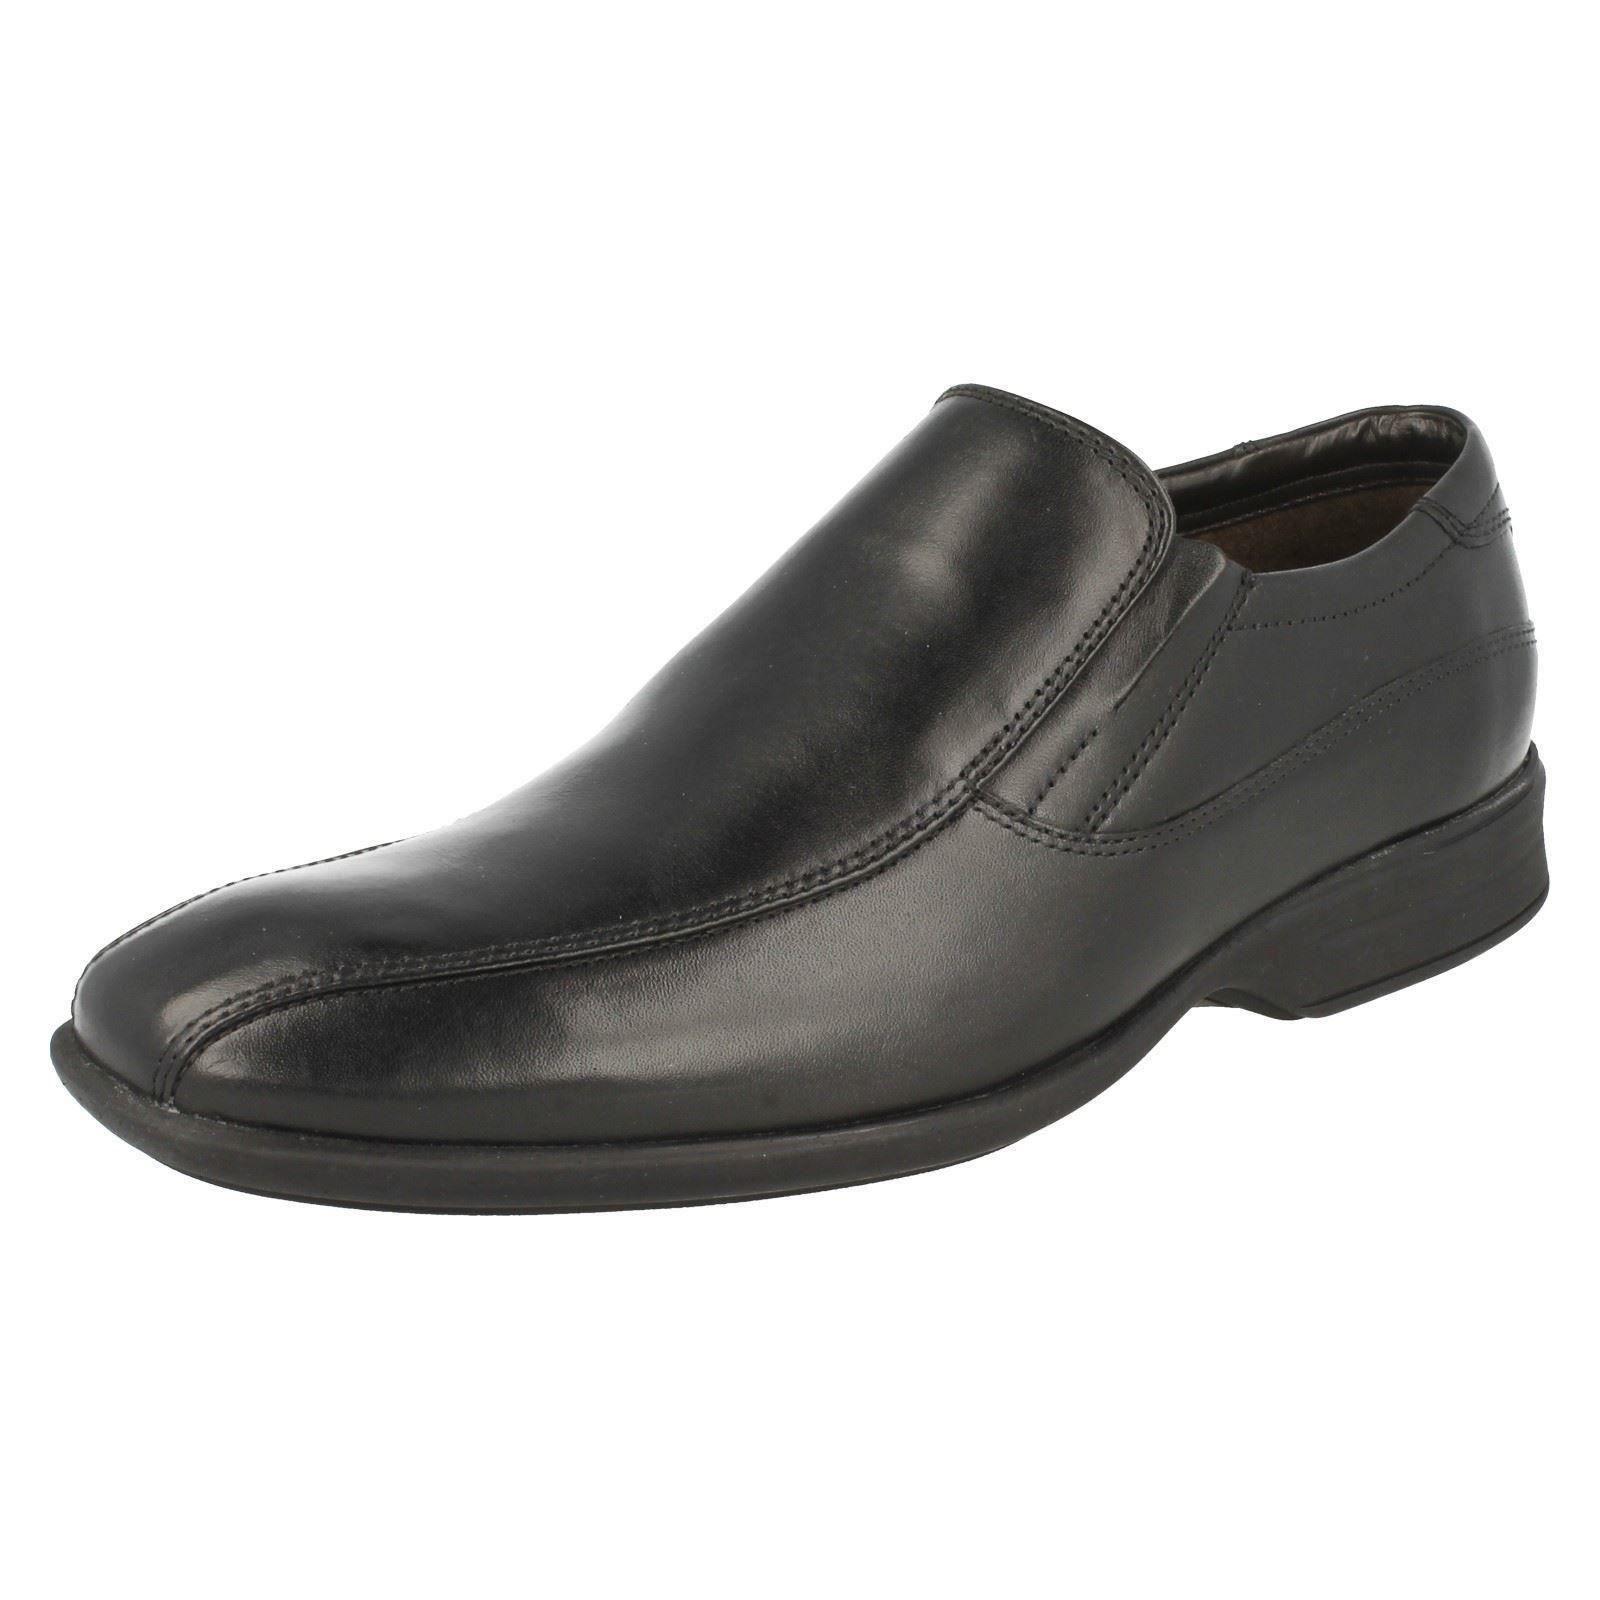 Clarks Cordones Zapatos Vestir Sin Hombre De Zancada Gadwell 4HxPnwpBq1